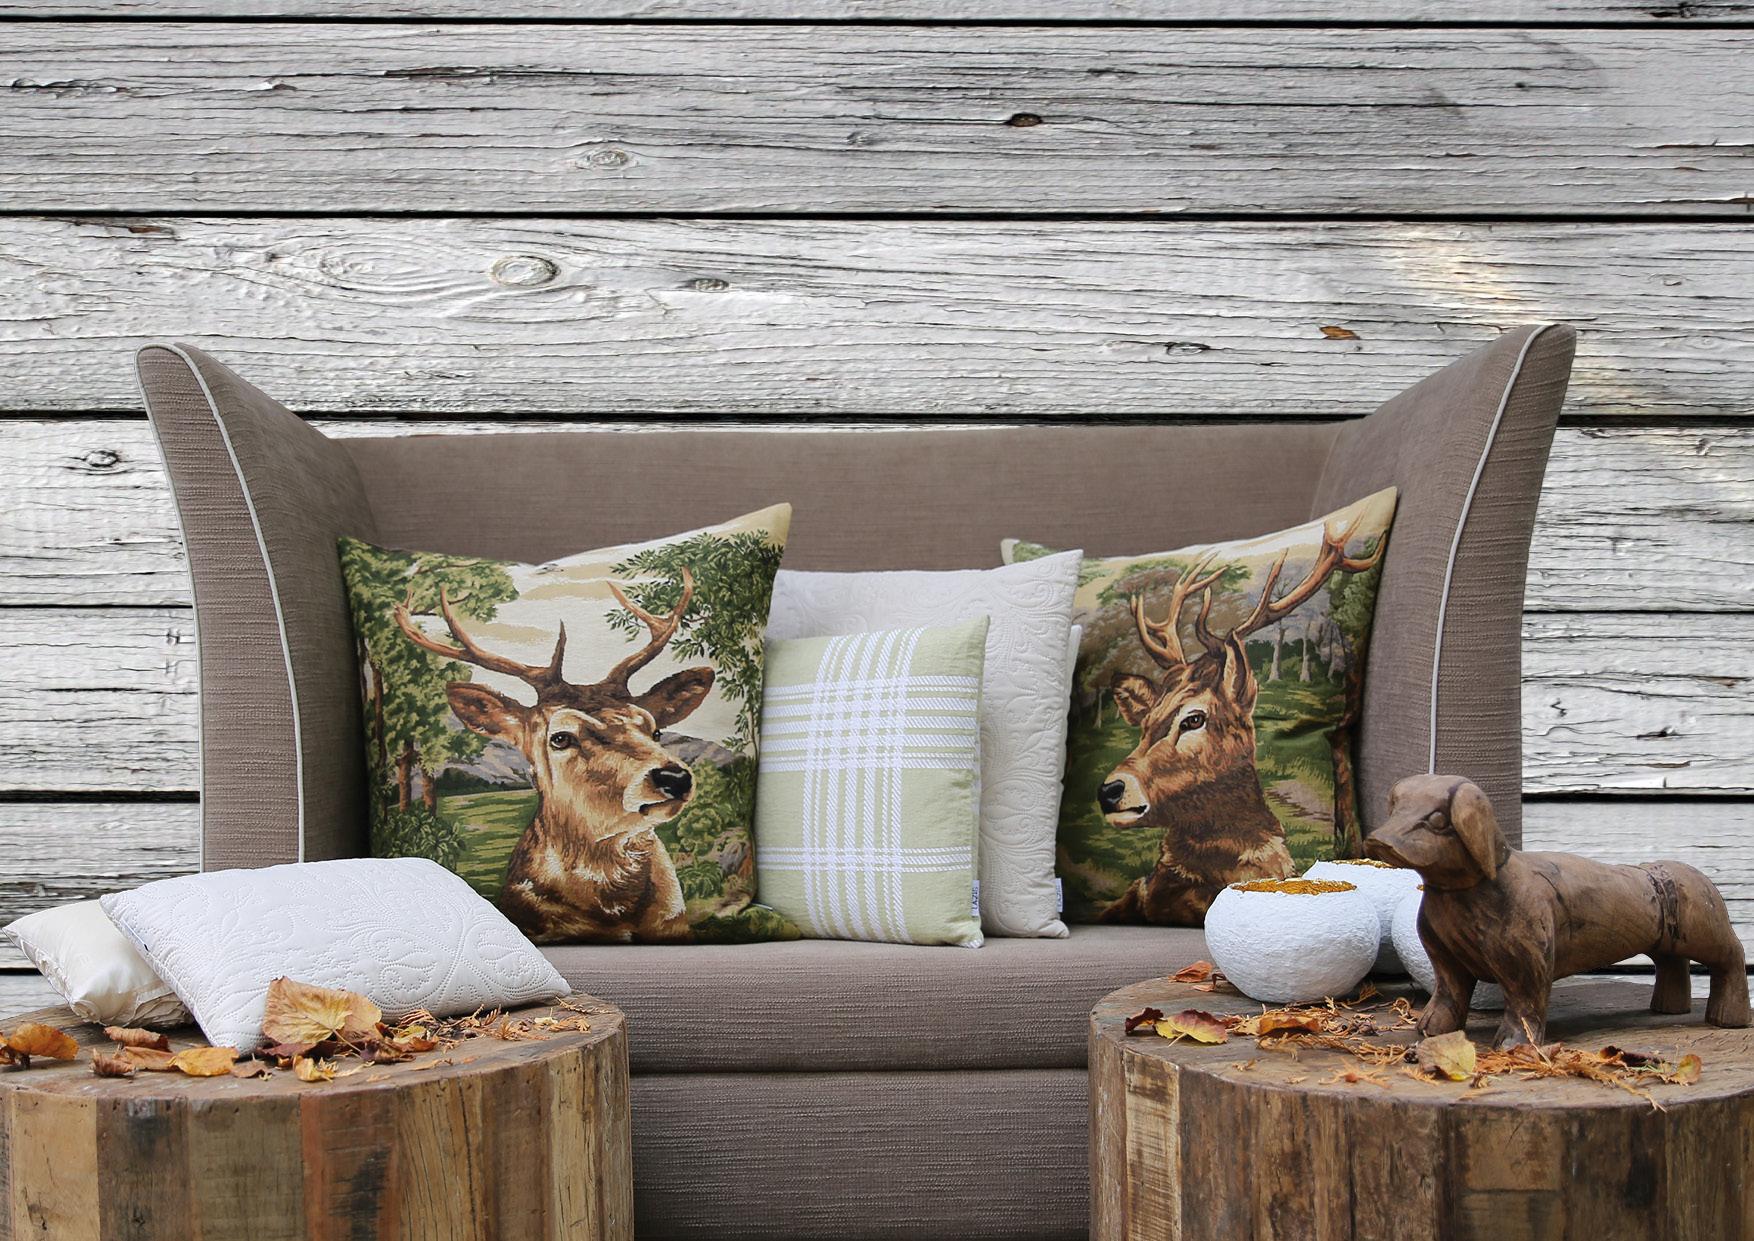 kissenh lle joseph lazis. Black Bedroom Furniture Sets. Home Design Ideas